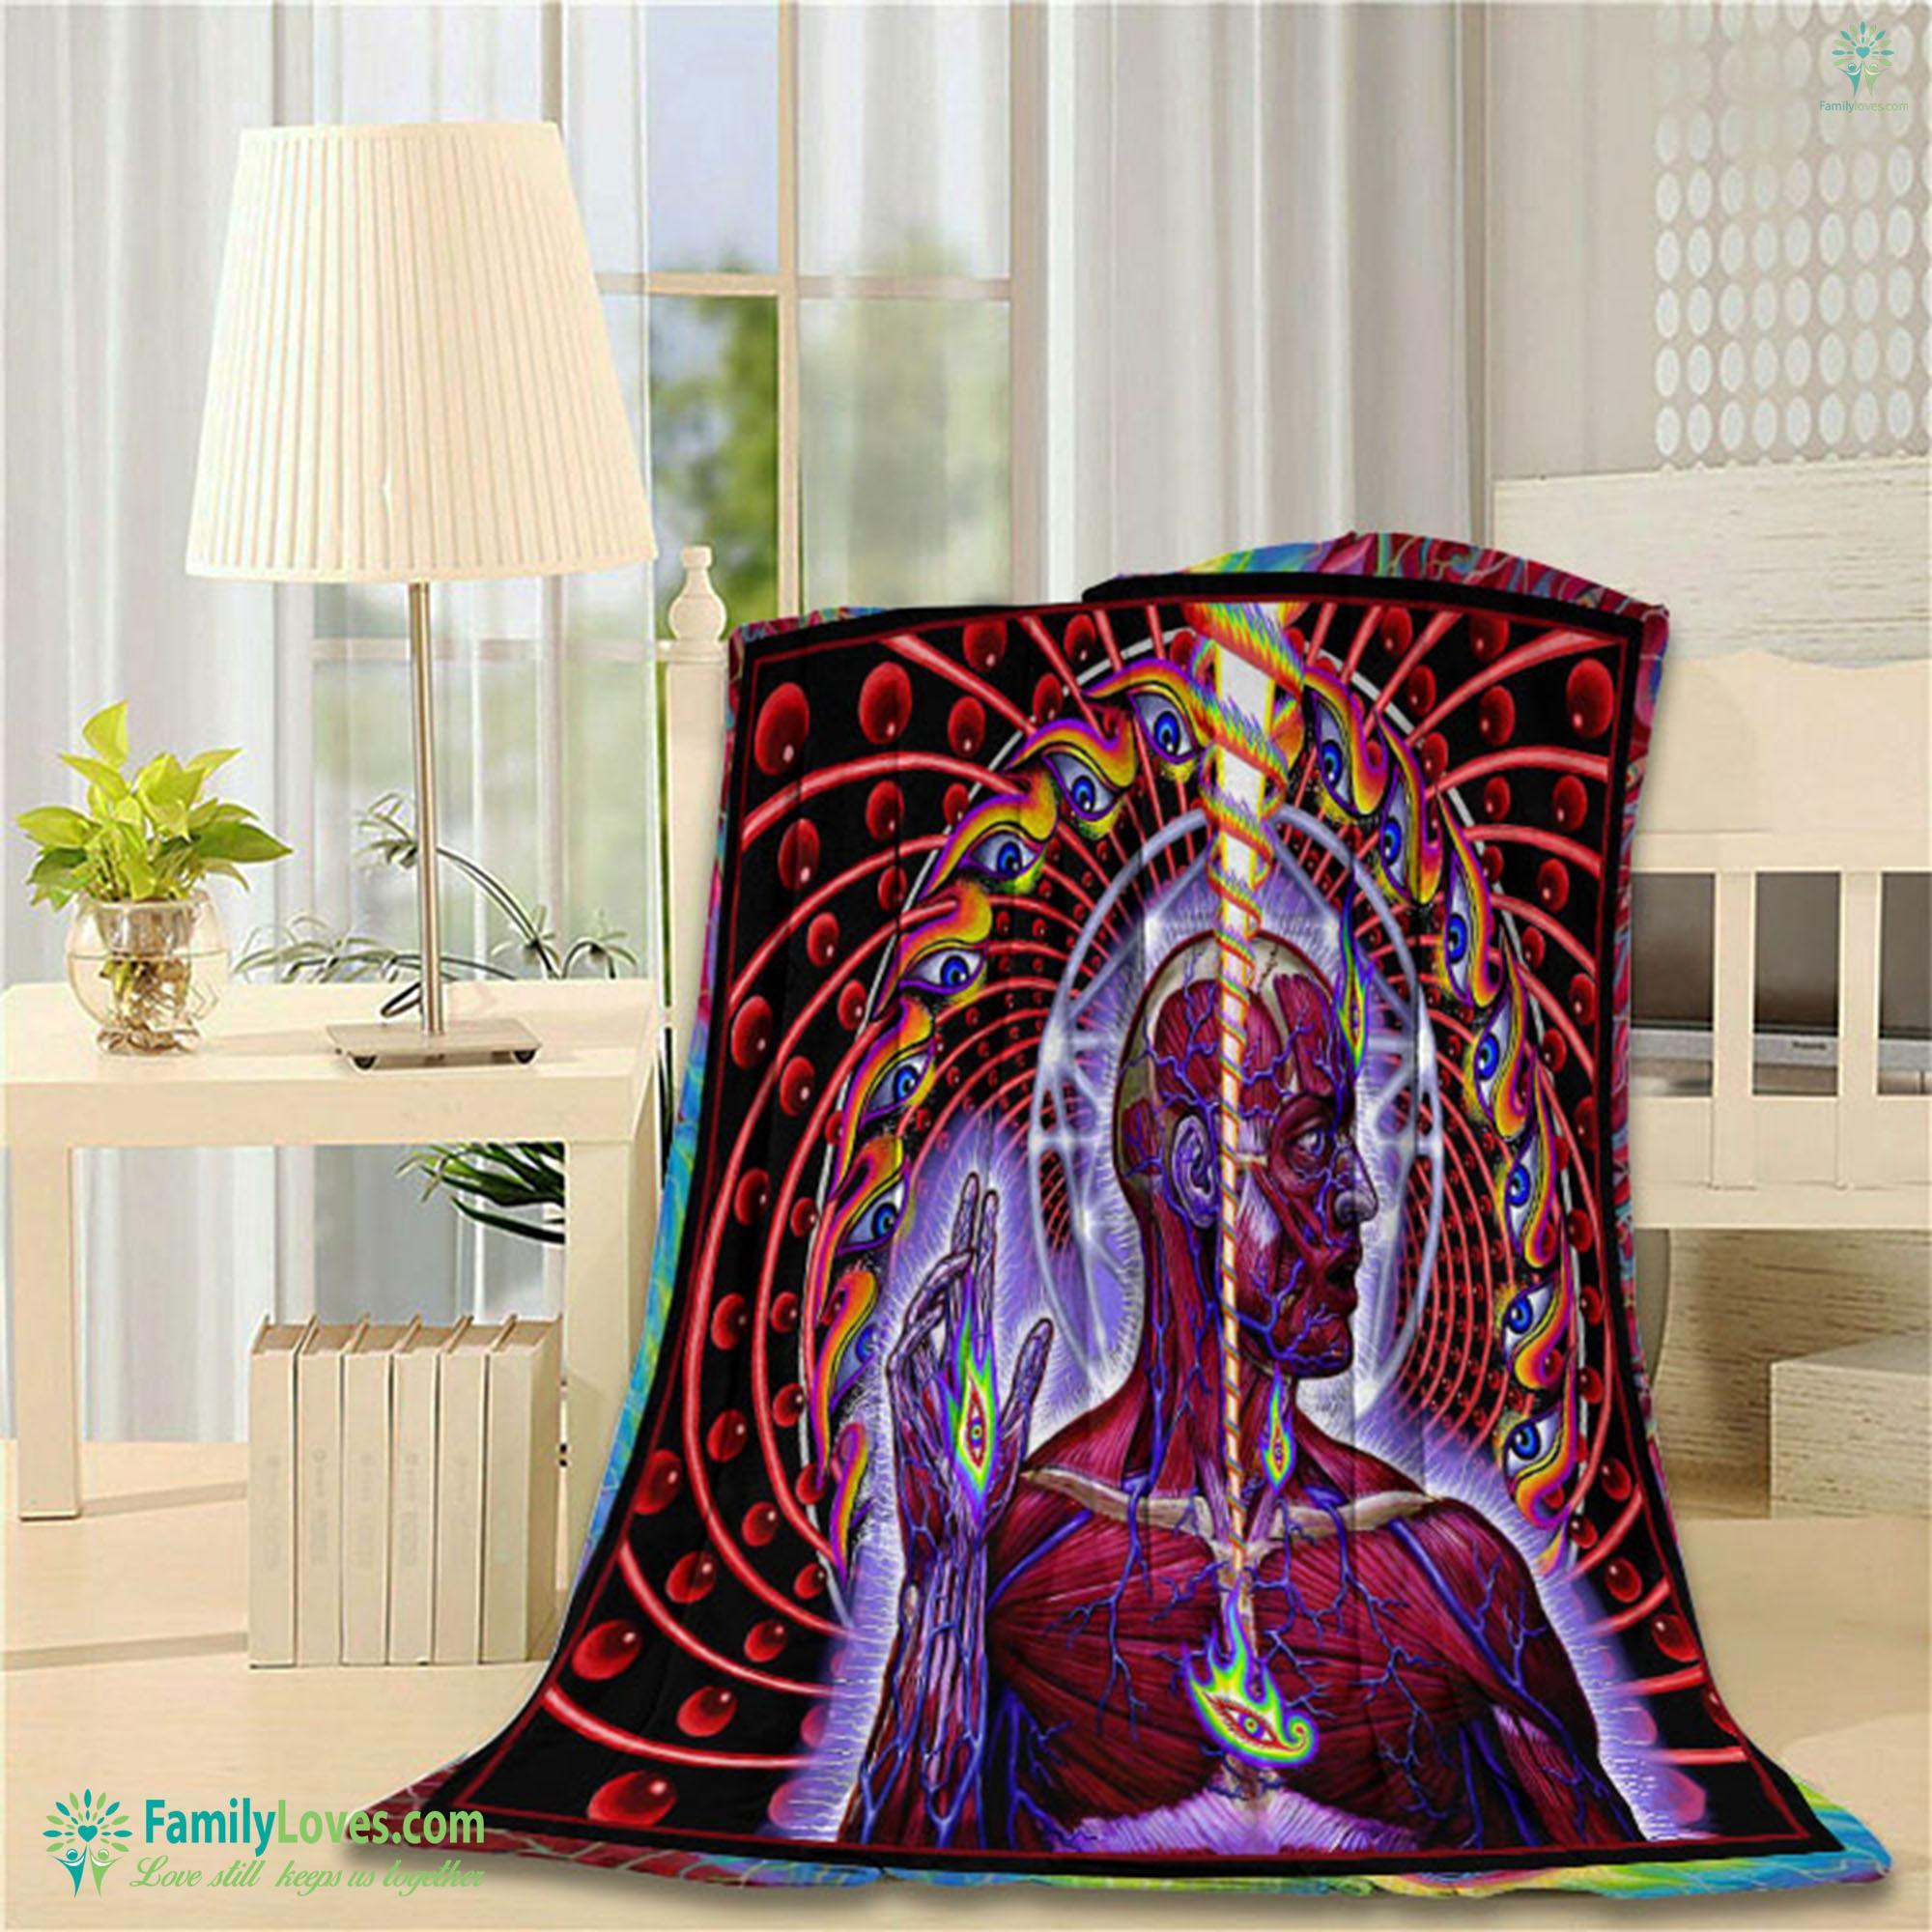 Tool Lateralus H Dd Blanket 21 Familyloves.com